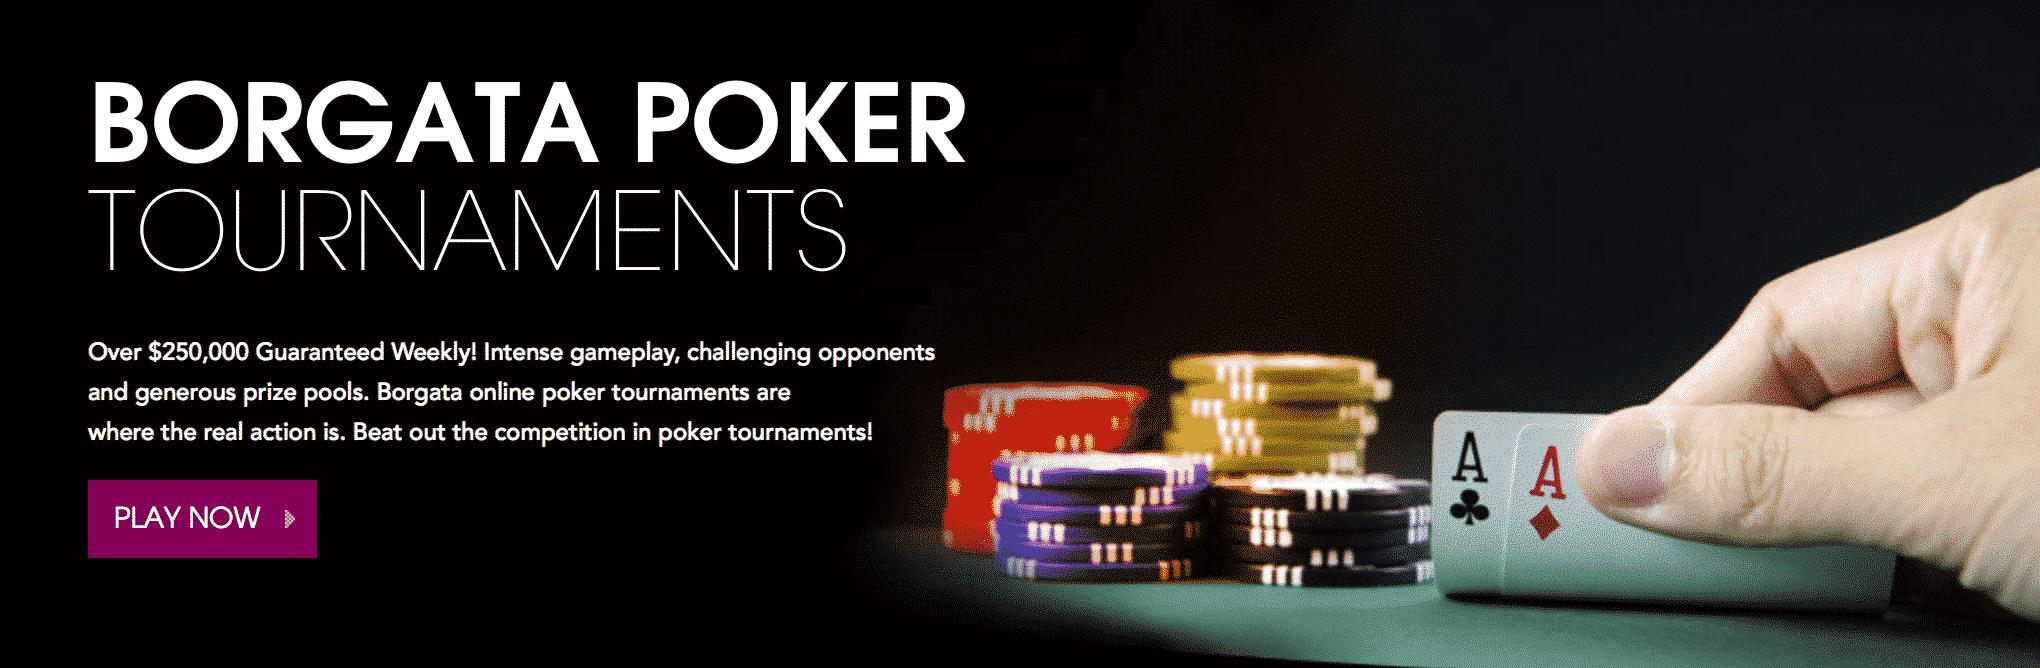 Borgata poker nj app online casino real money